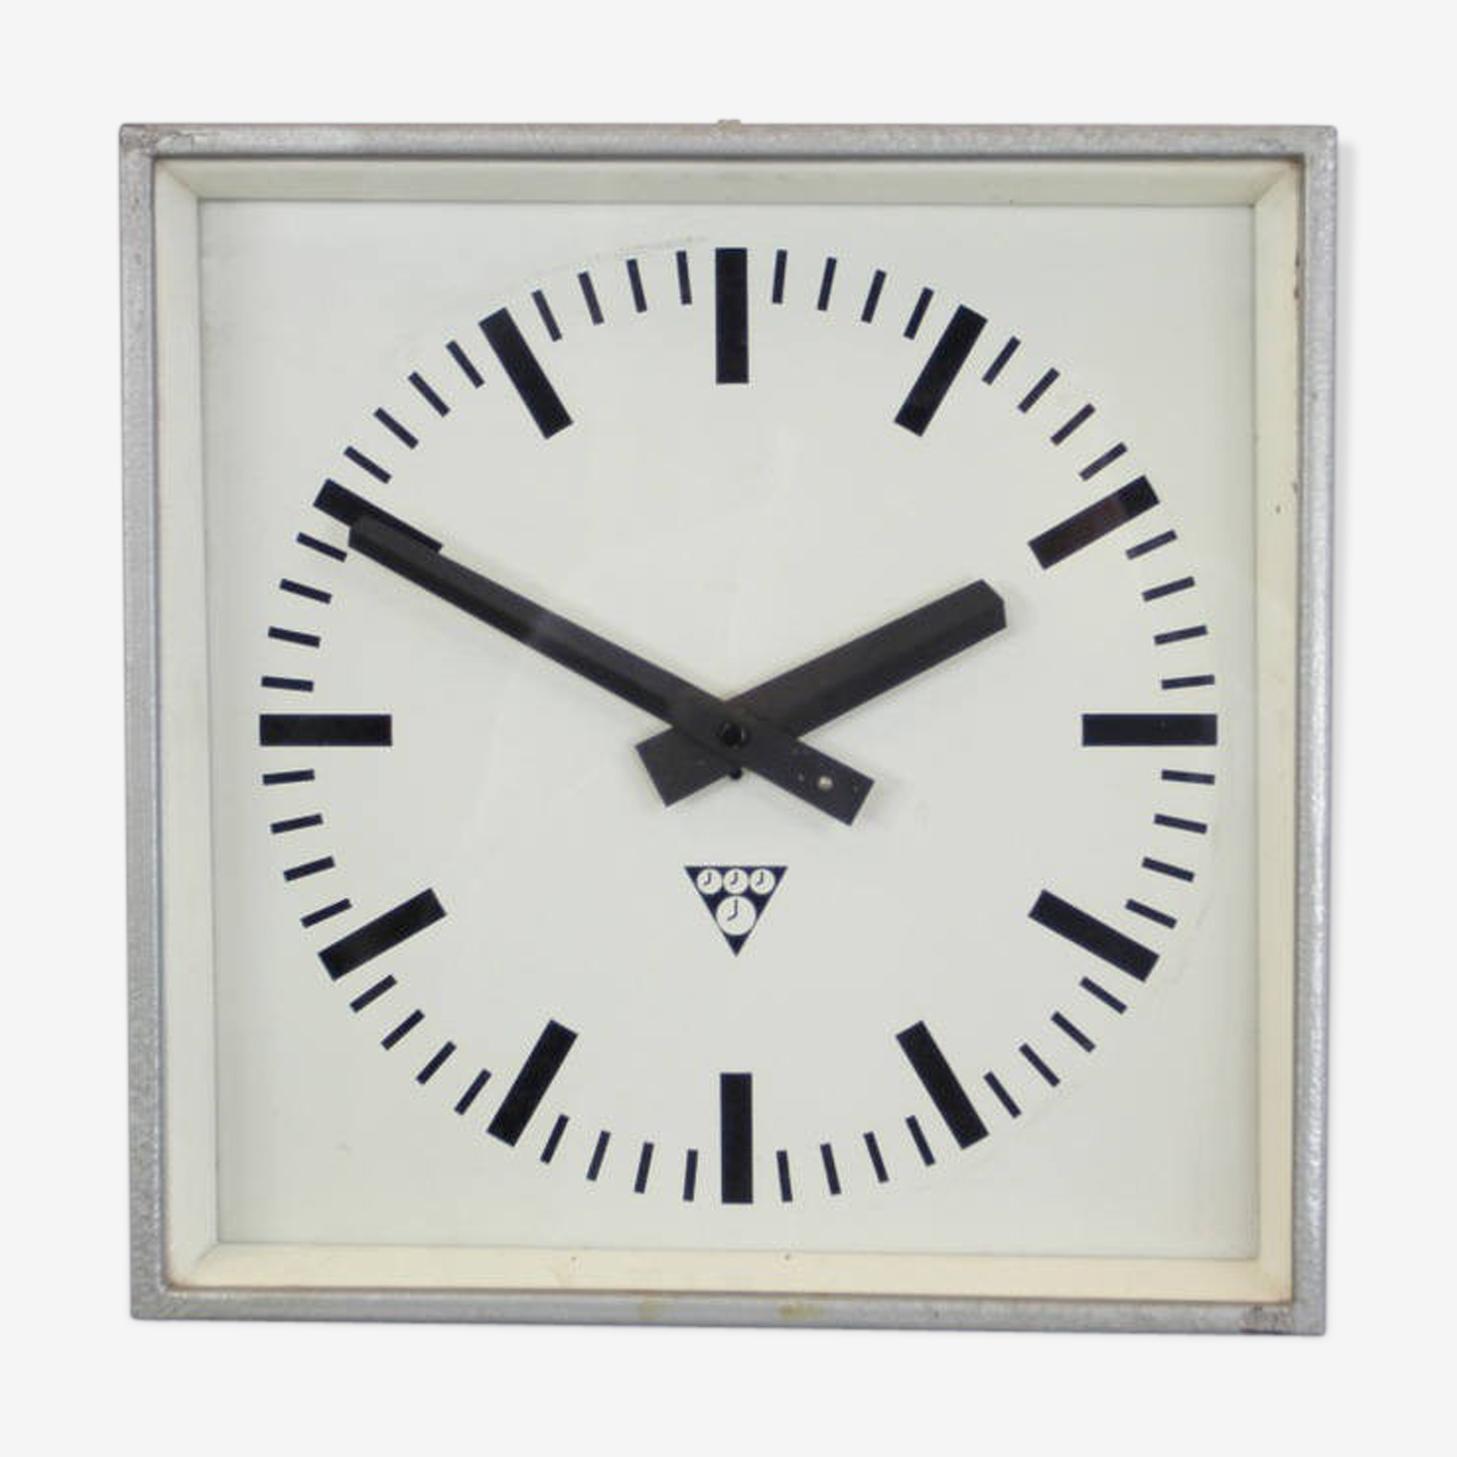 Horloges usine par Pragotron circa 1960